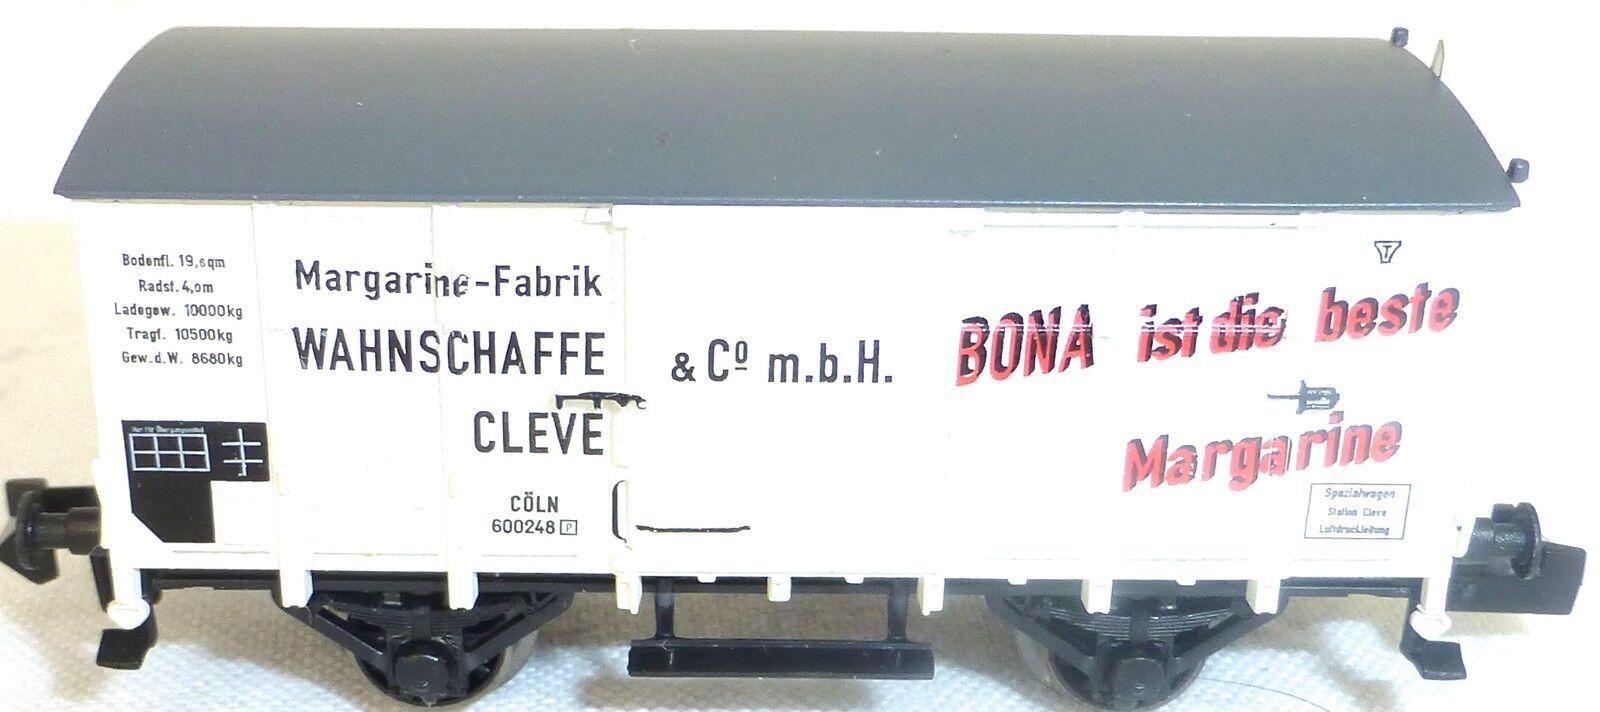 Bona Margarina Vagón de Mercancía Colonia 600248 Nuevo sin Emb.orig Fleischmann